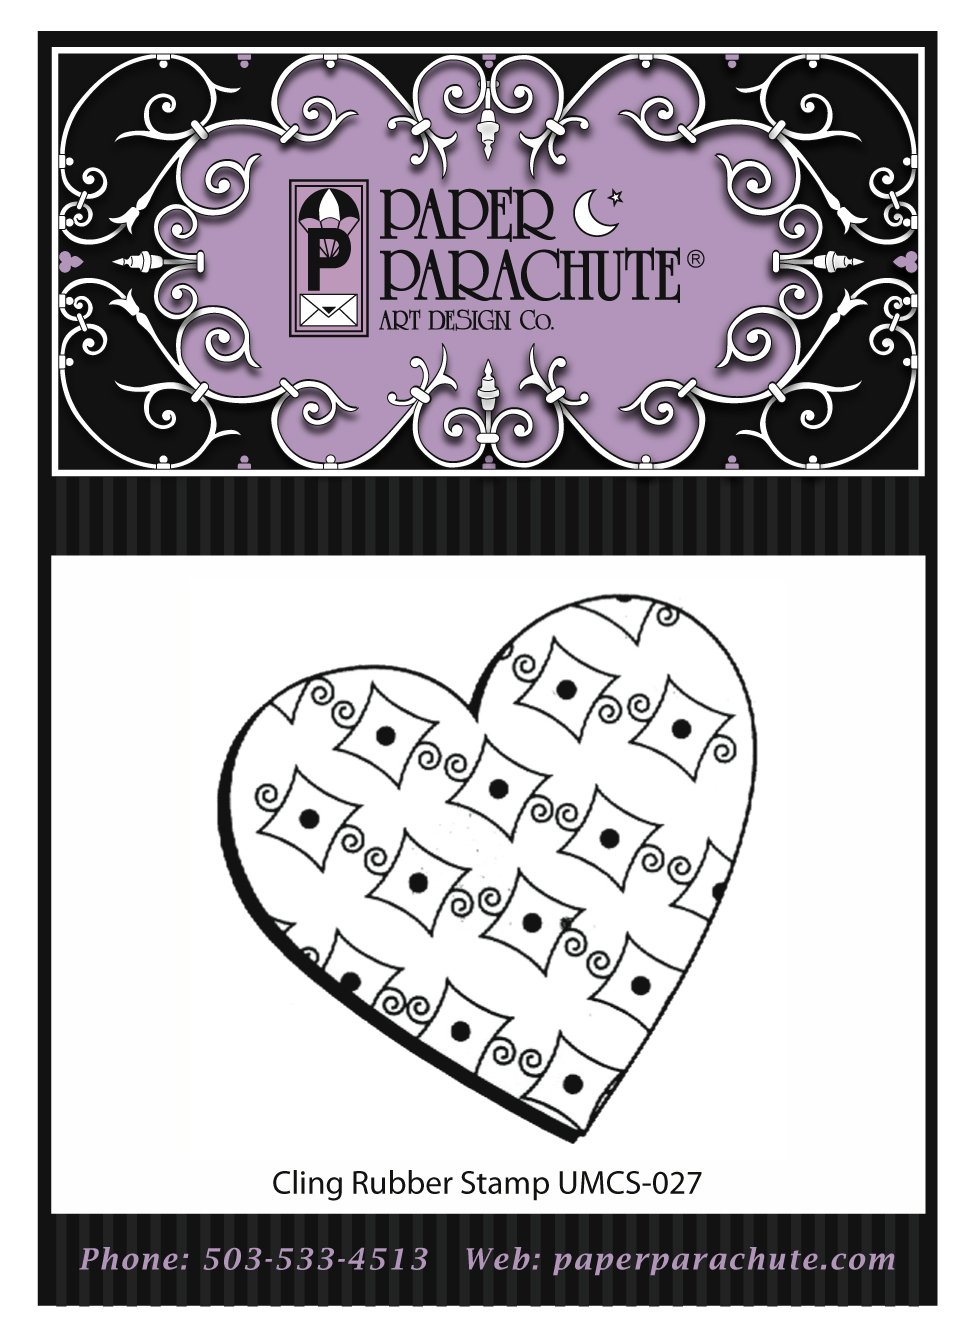 Paper Parachute Rubber Stamp - UMCS27